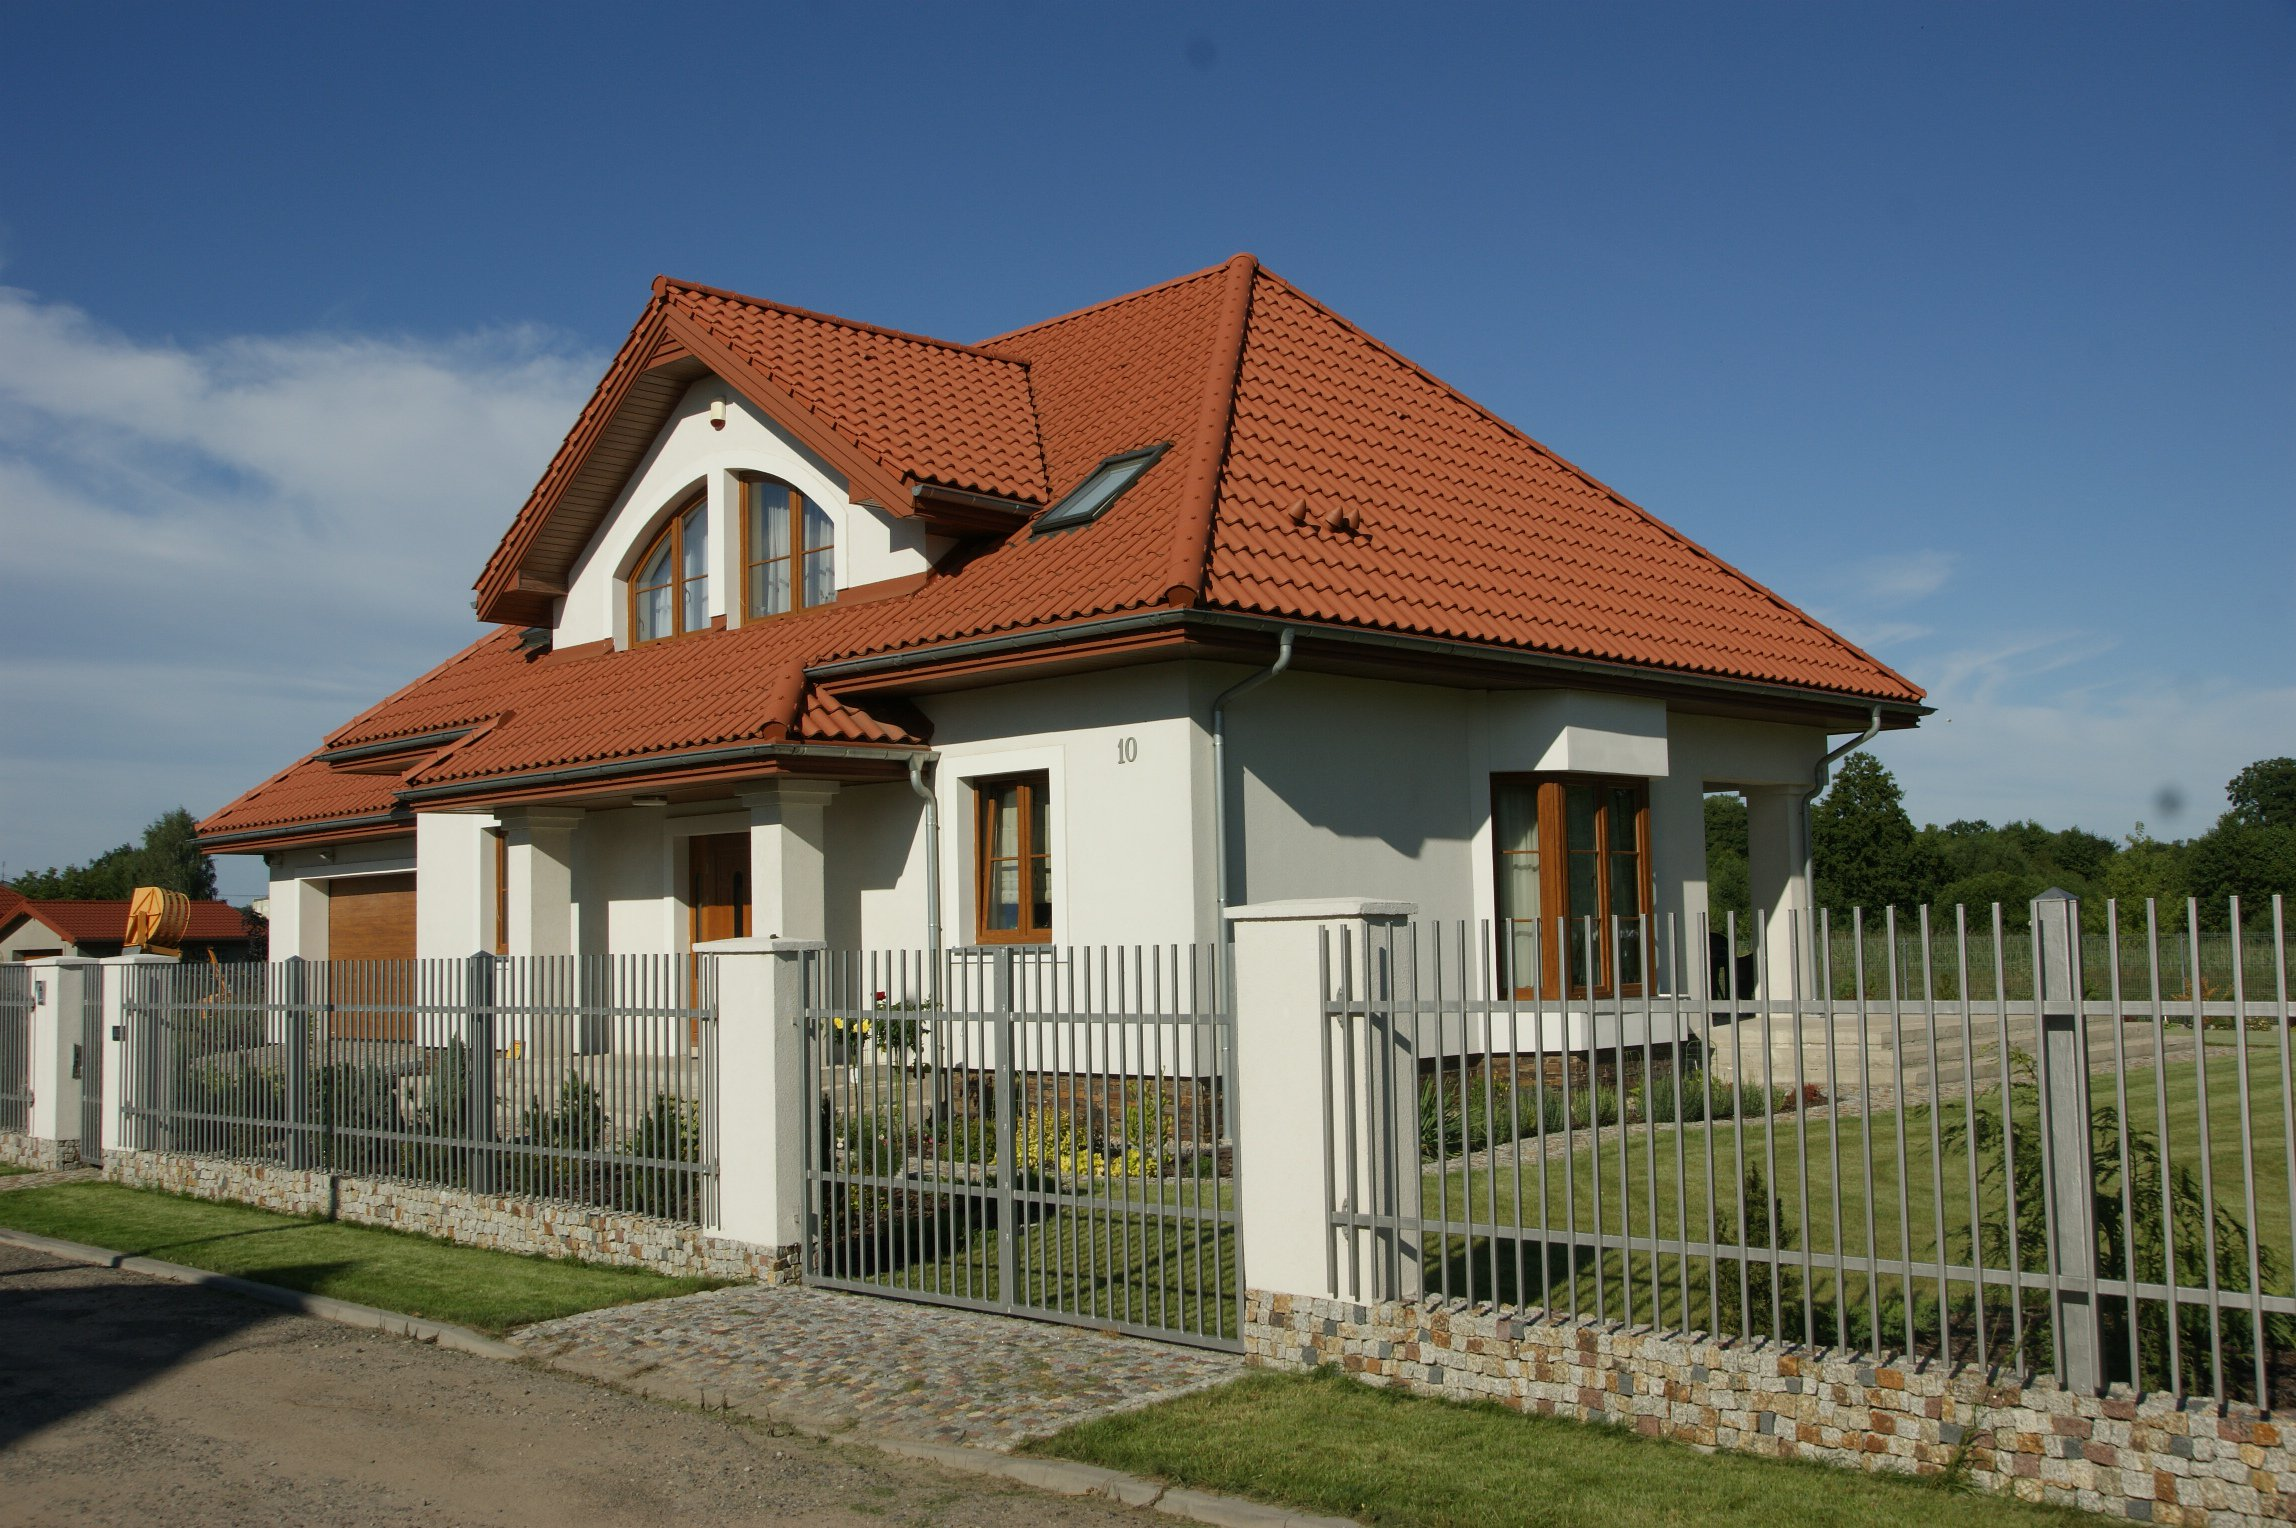 andrzej-dusinski-134648761787.jpg